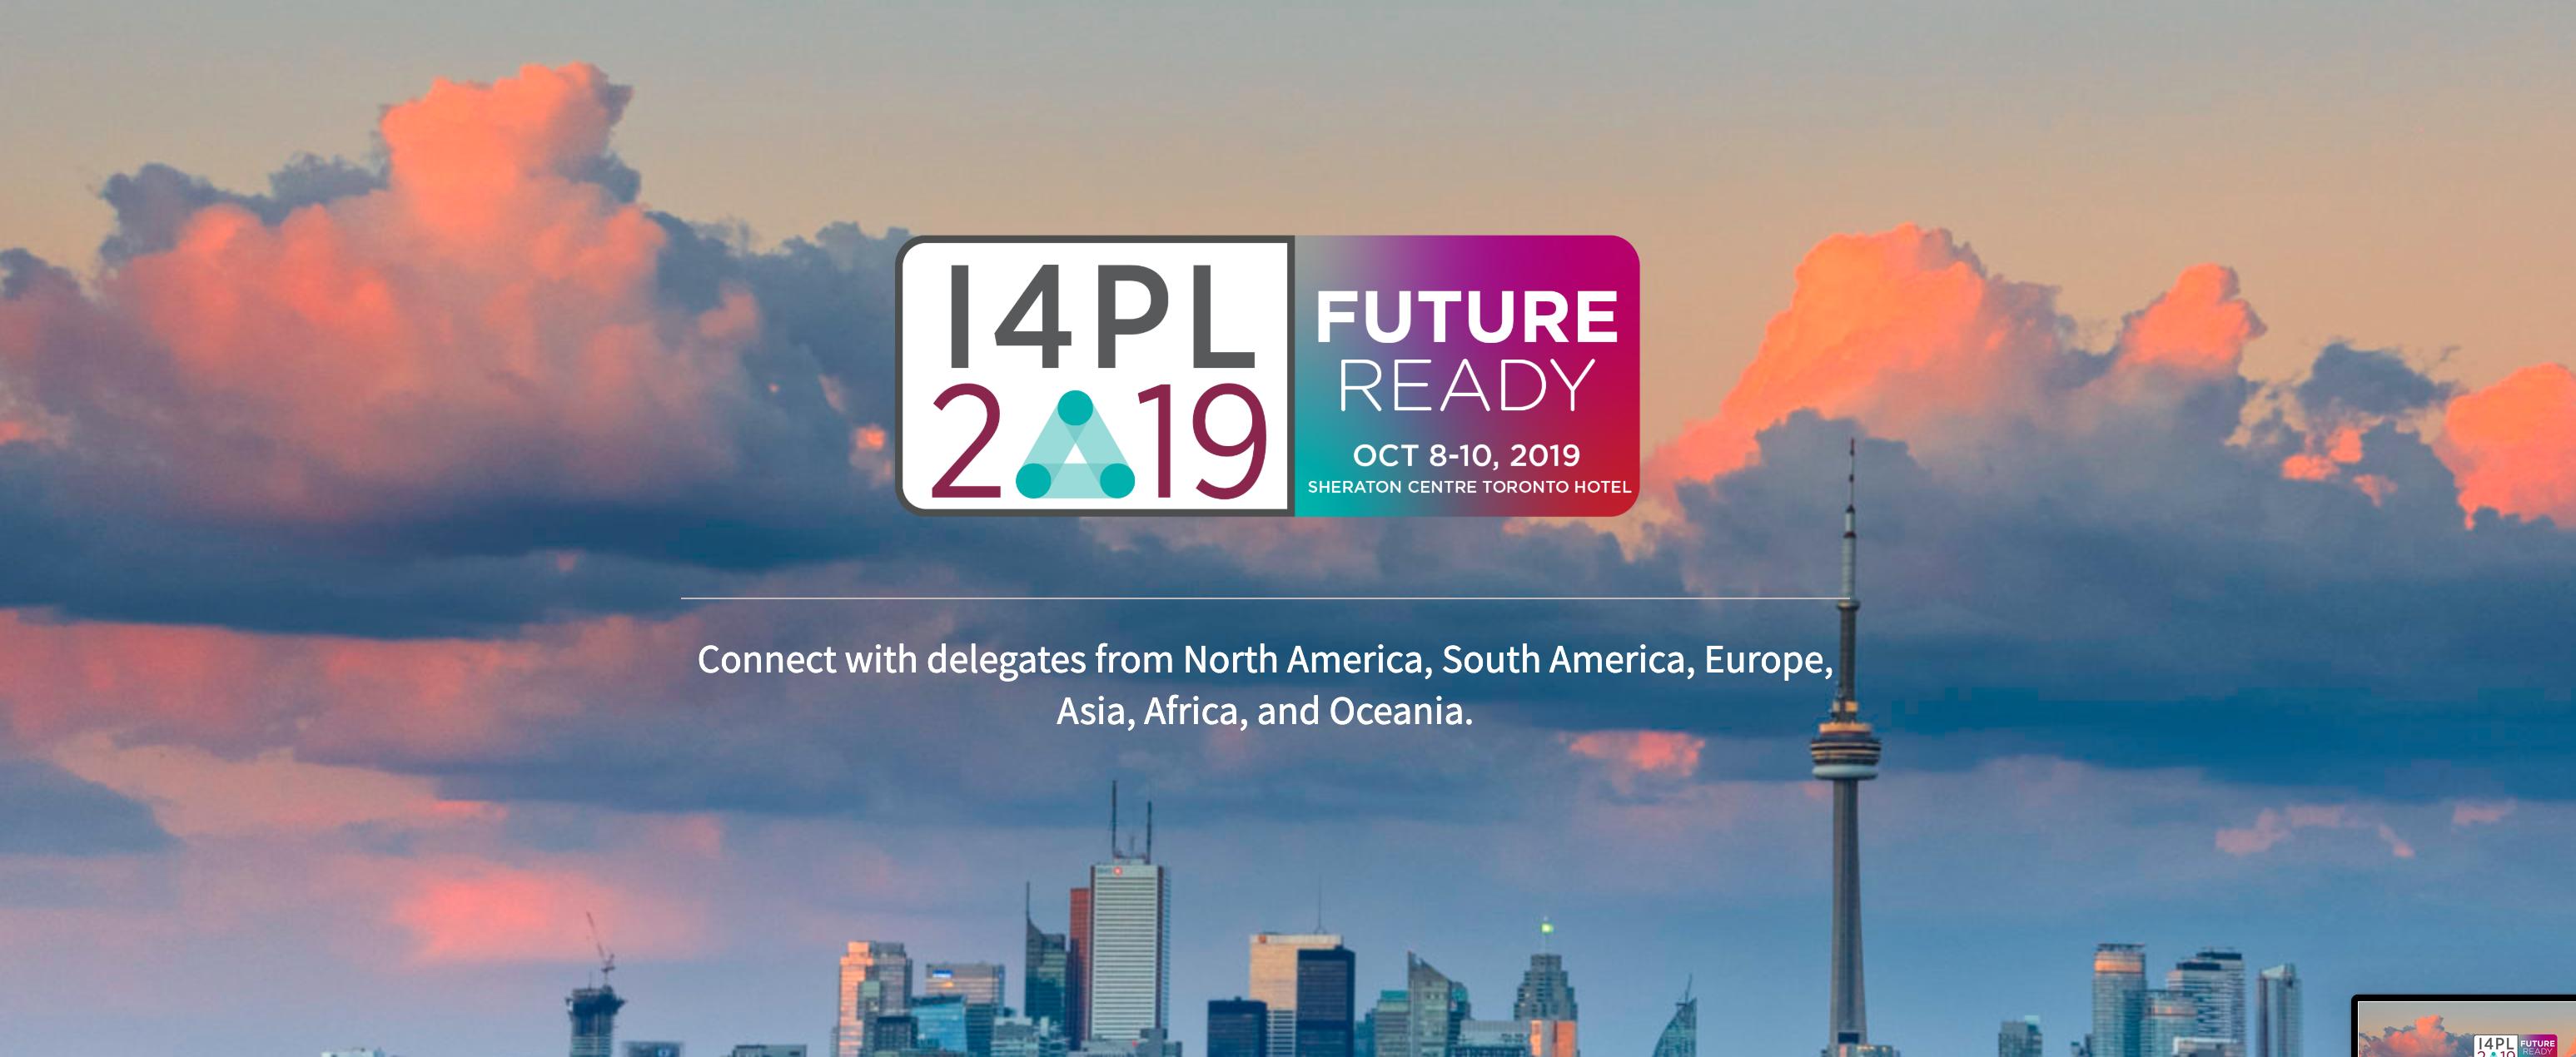 October 8-10: I4PL 2019